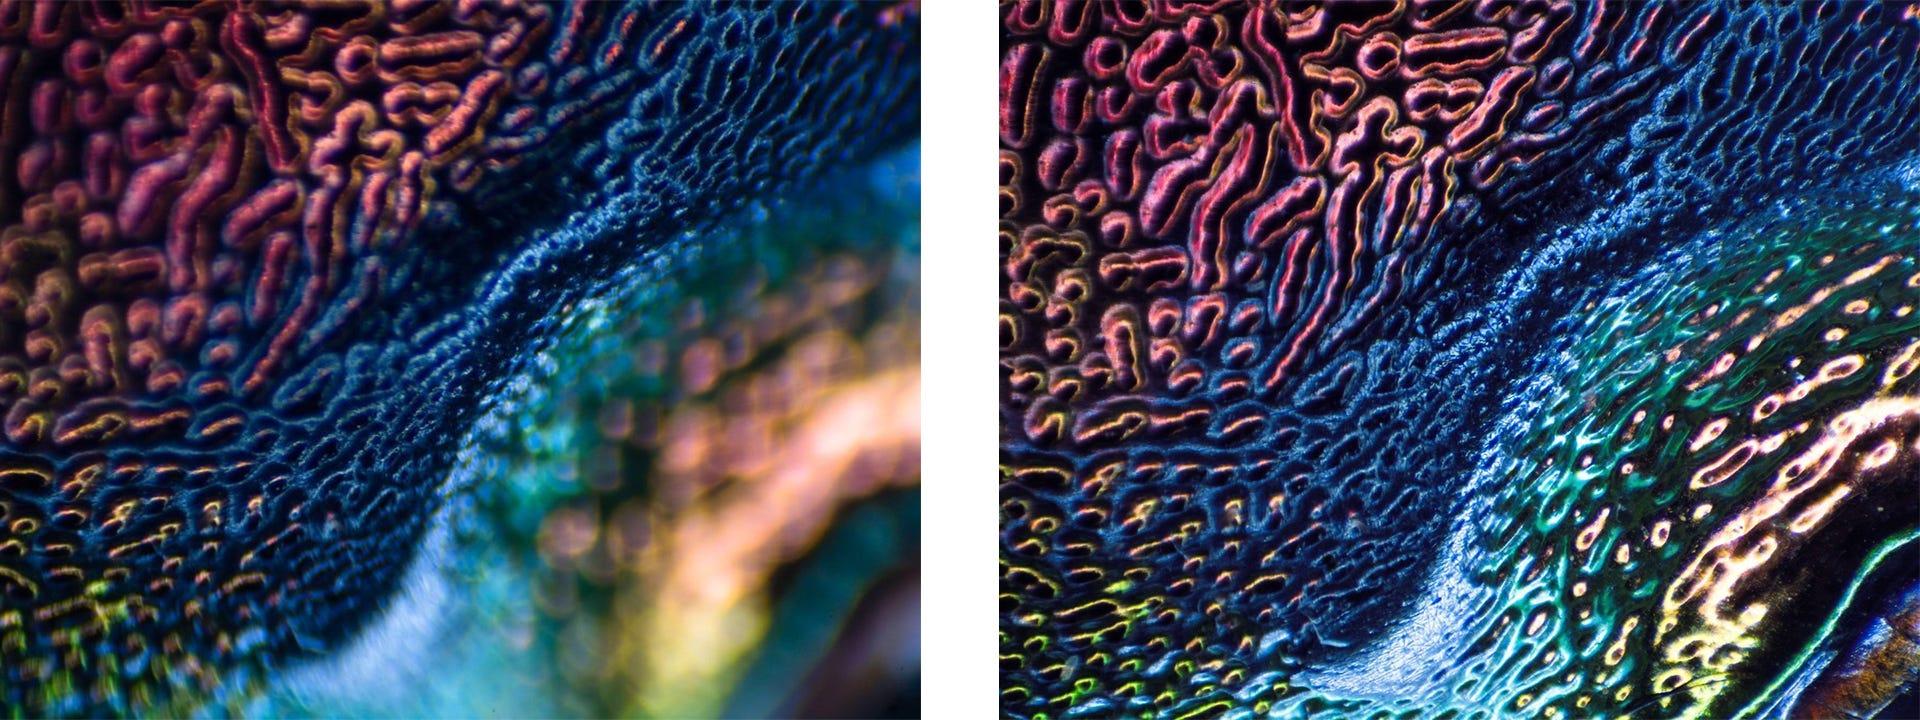 photo micrography close up image